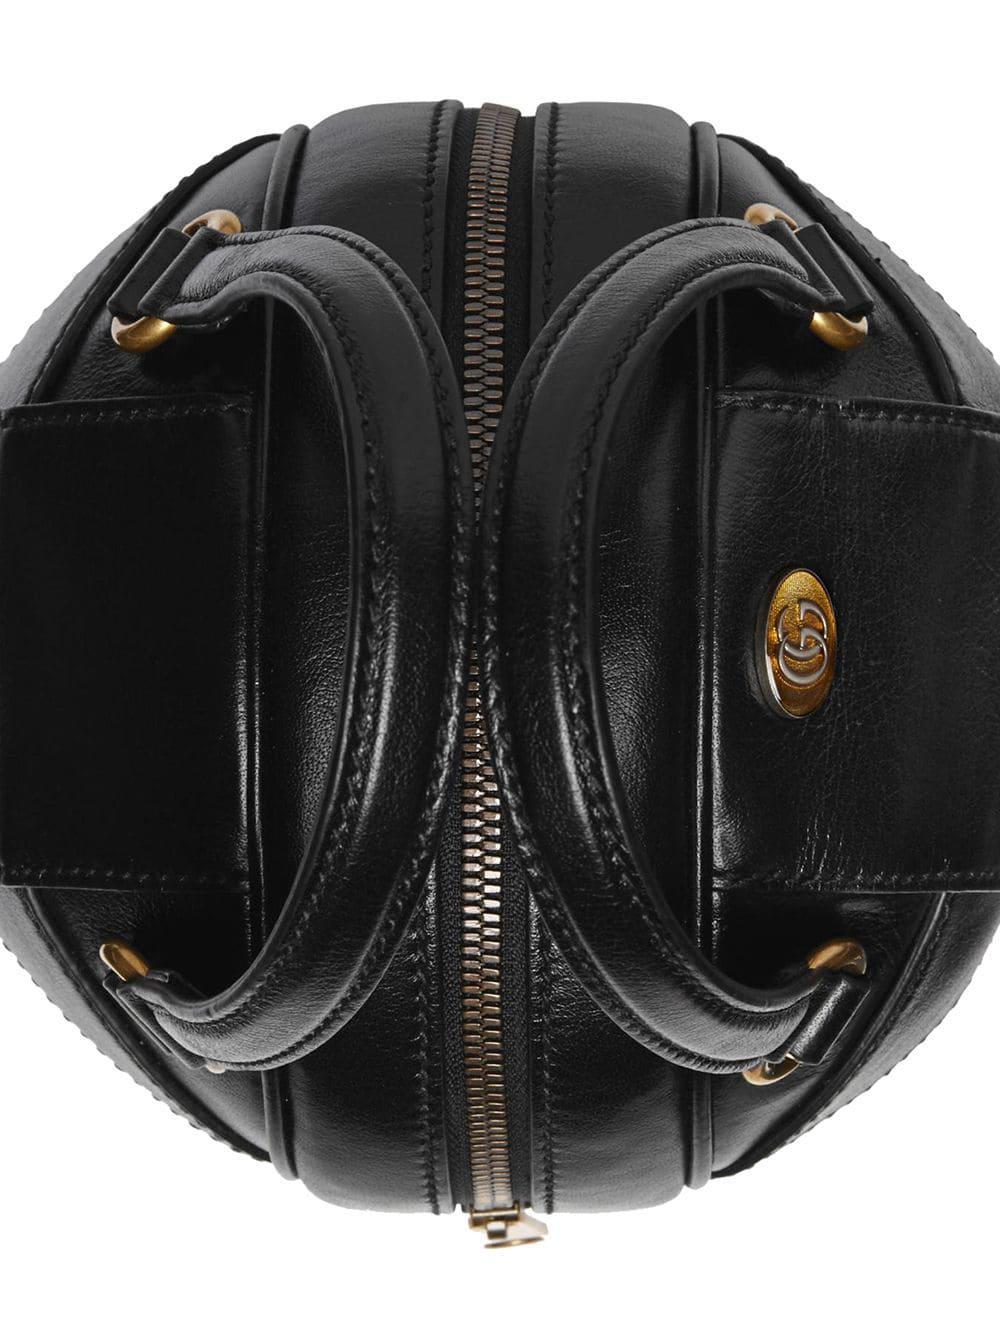 965a77b70b6 Gucci - Black Basketball Shaped Mini Shoulder Bag - Lyst. View fullscreen